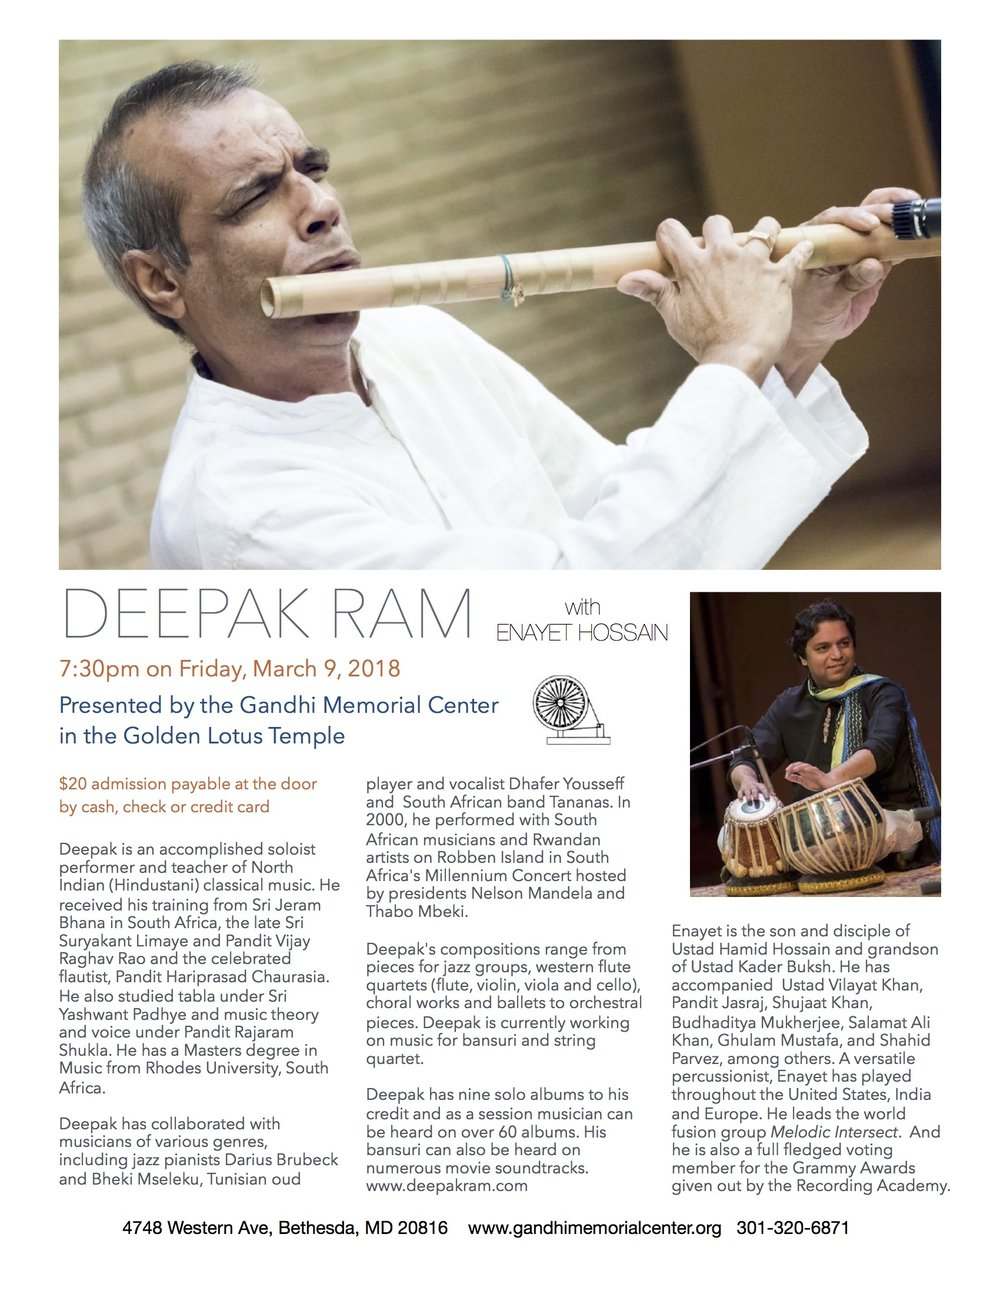 Deepak Ram and Enayet Hossain.jpg